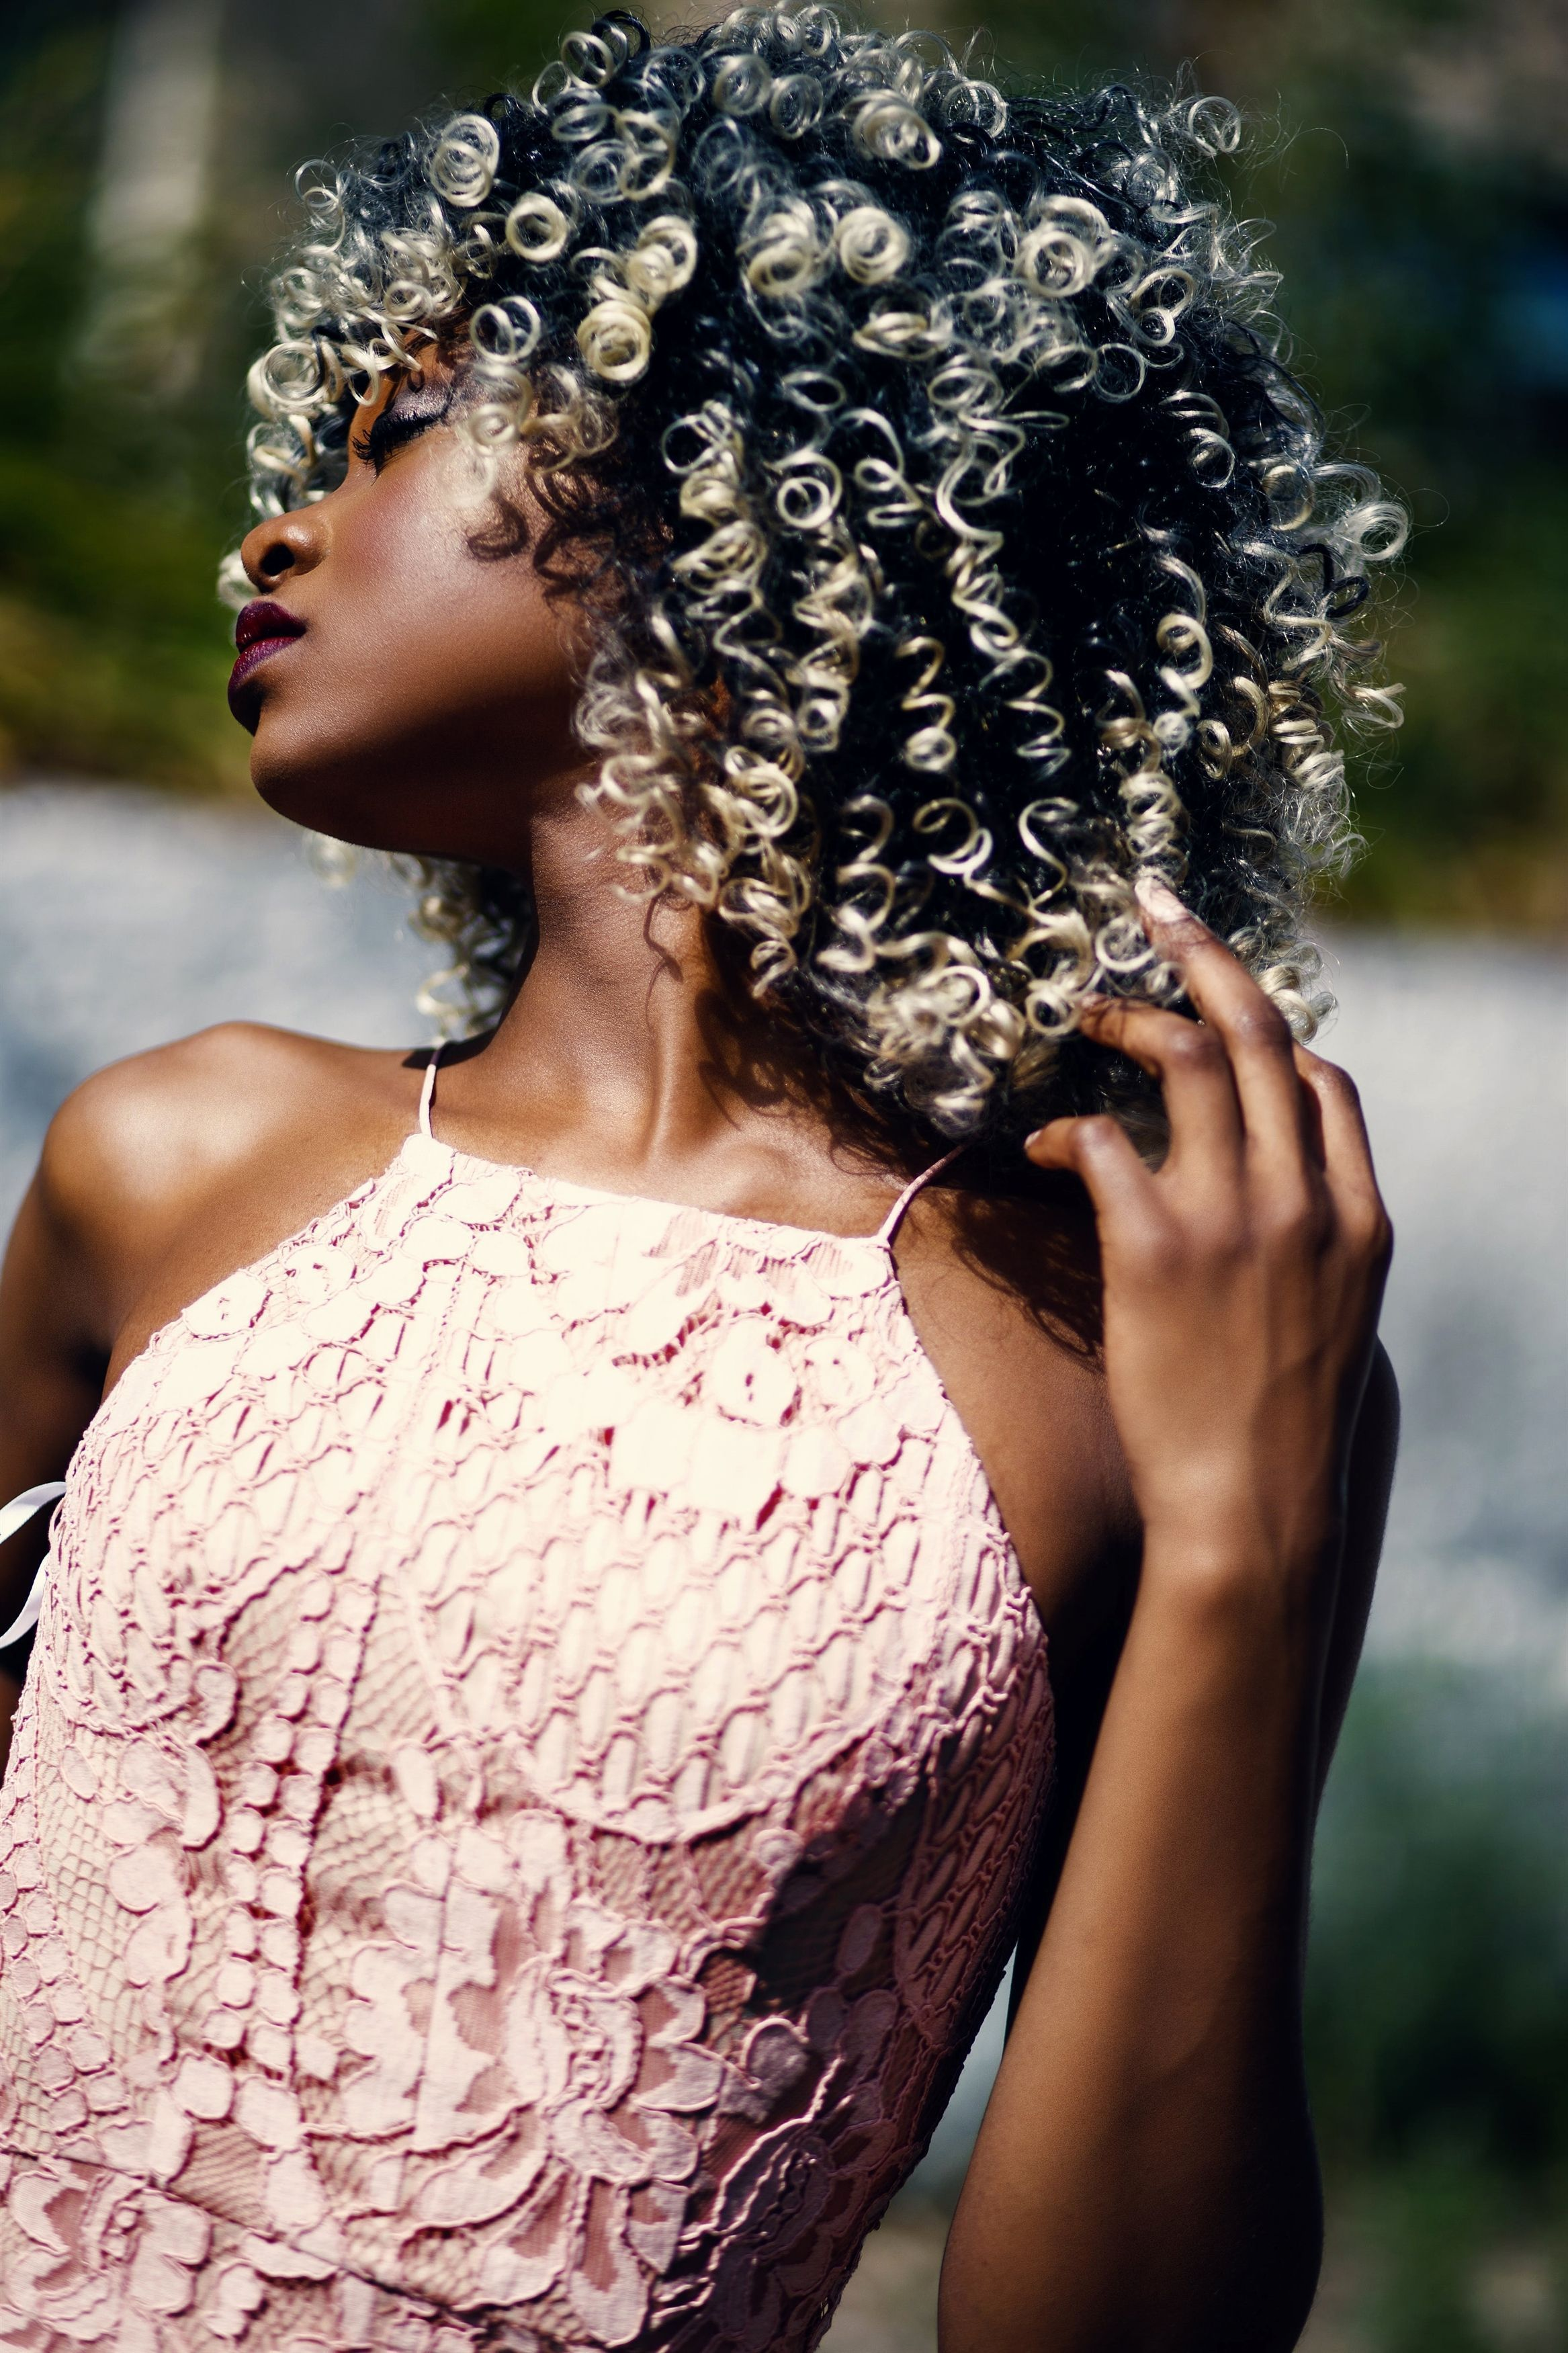 Coypal photo hair hair model pictures hair reviews